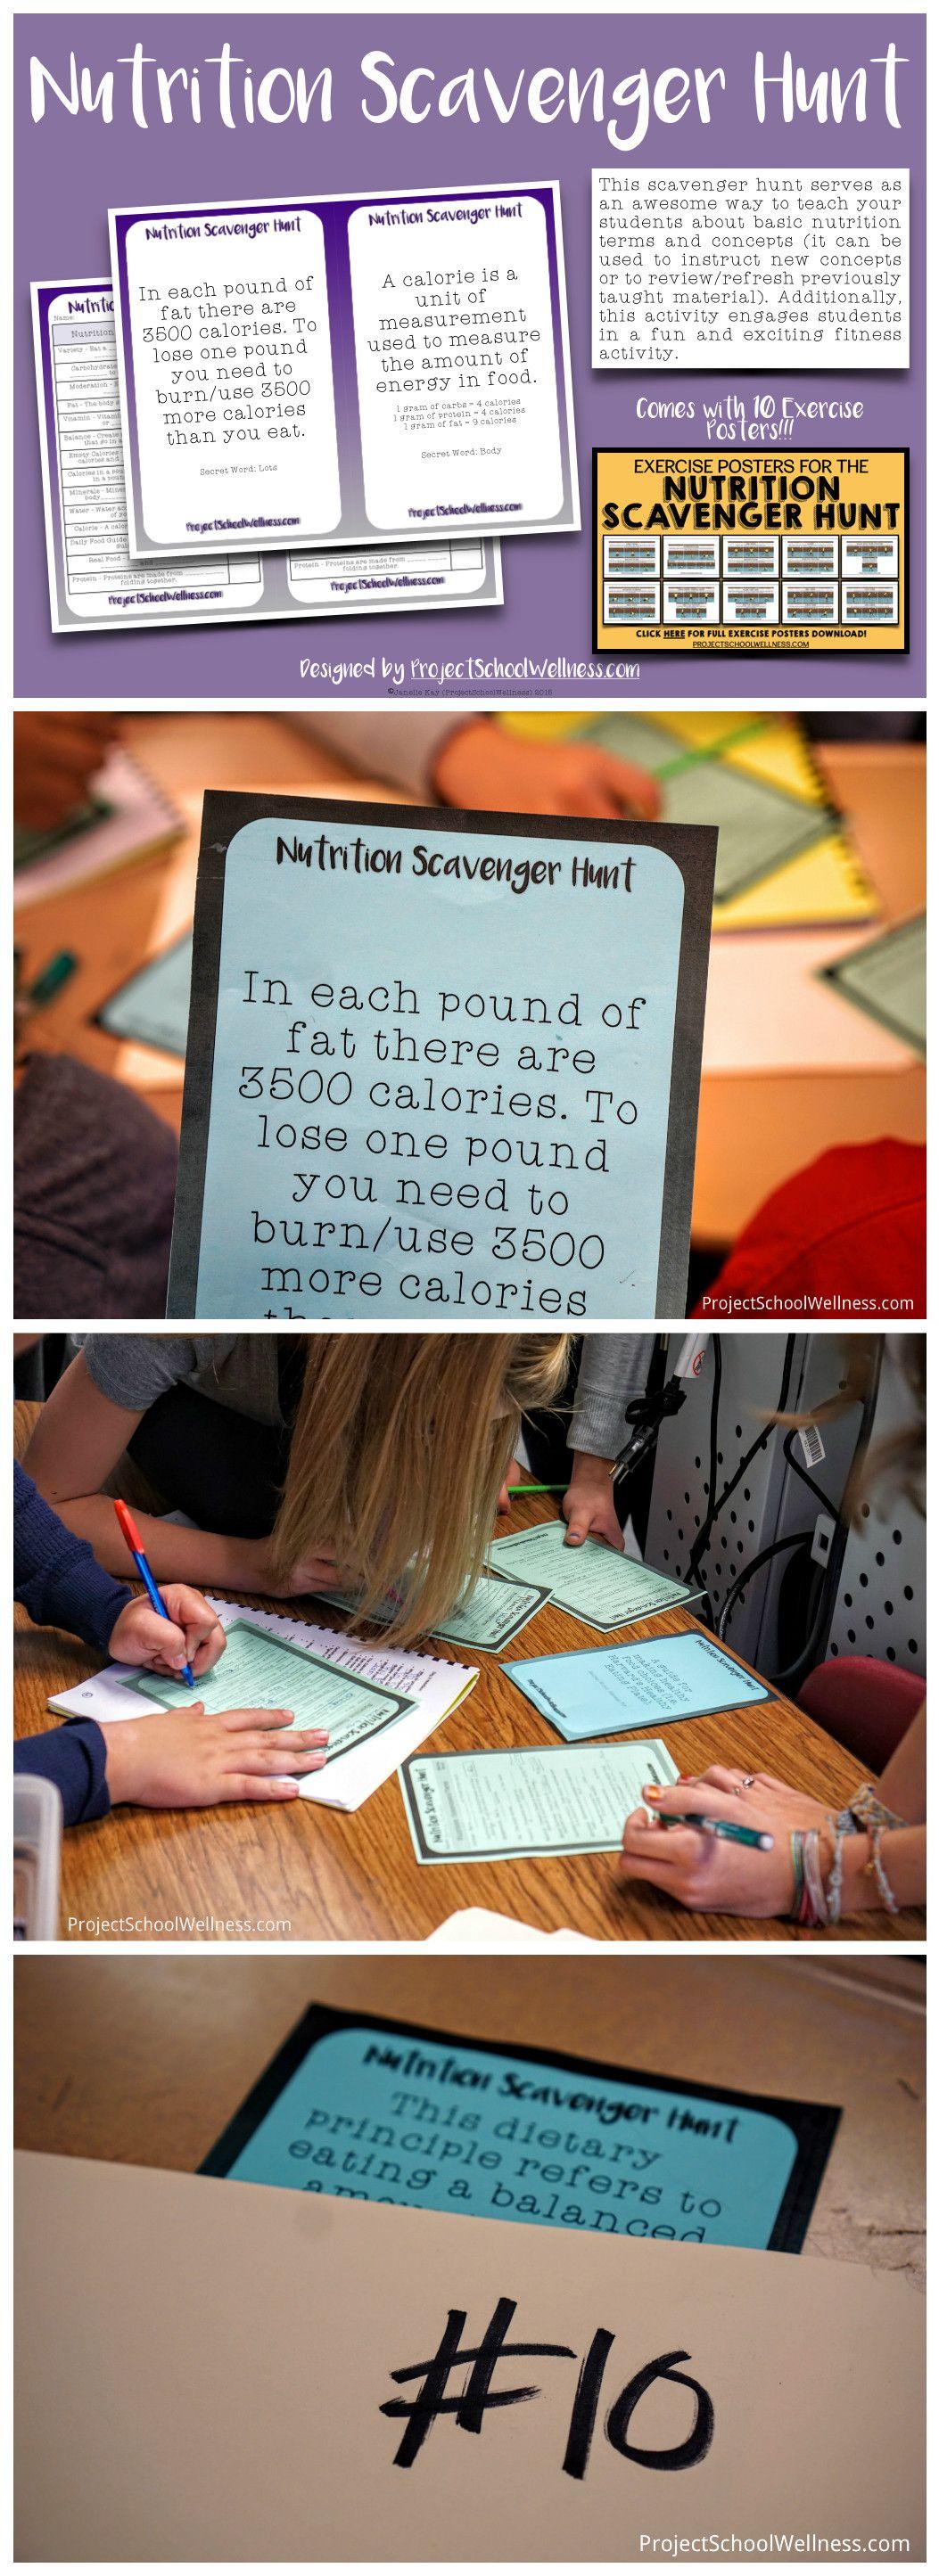 Nutrition Scavenger Hunt Middle School Health Amp Wellness